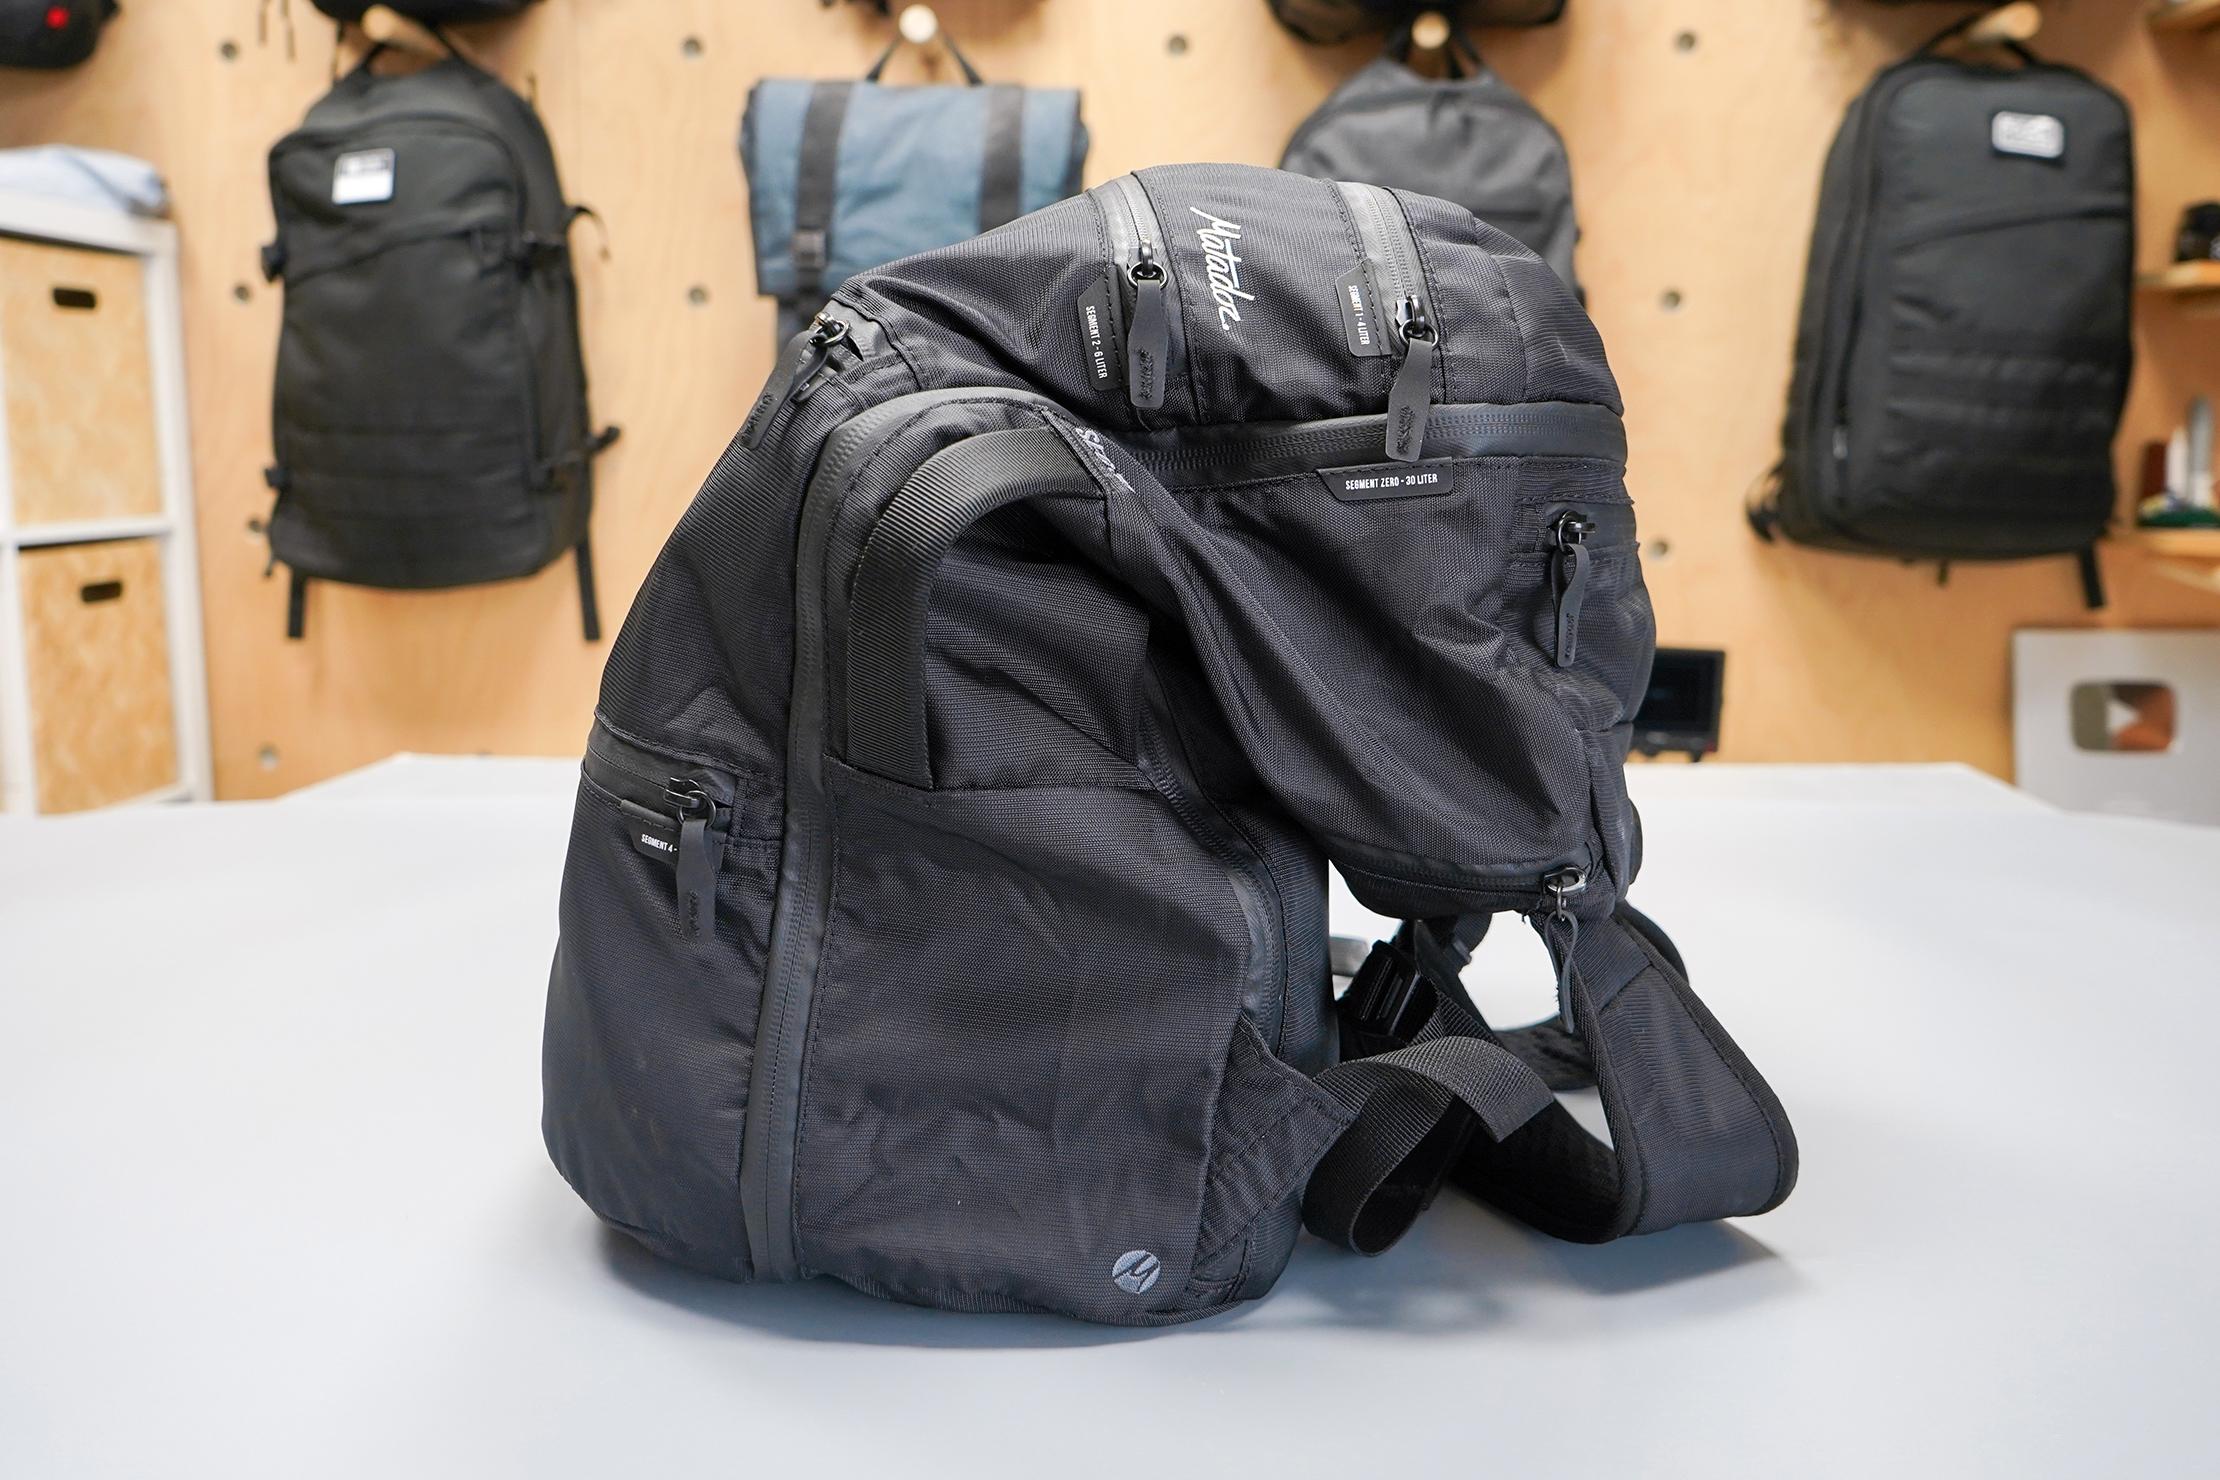 Matador SEG30 Backpack | 8-liter compartment not utilized